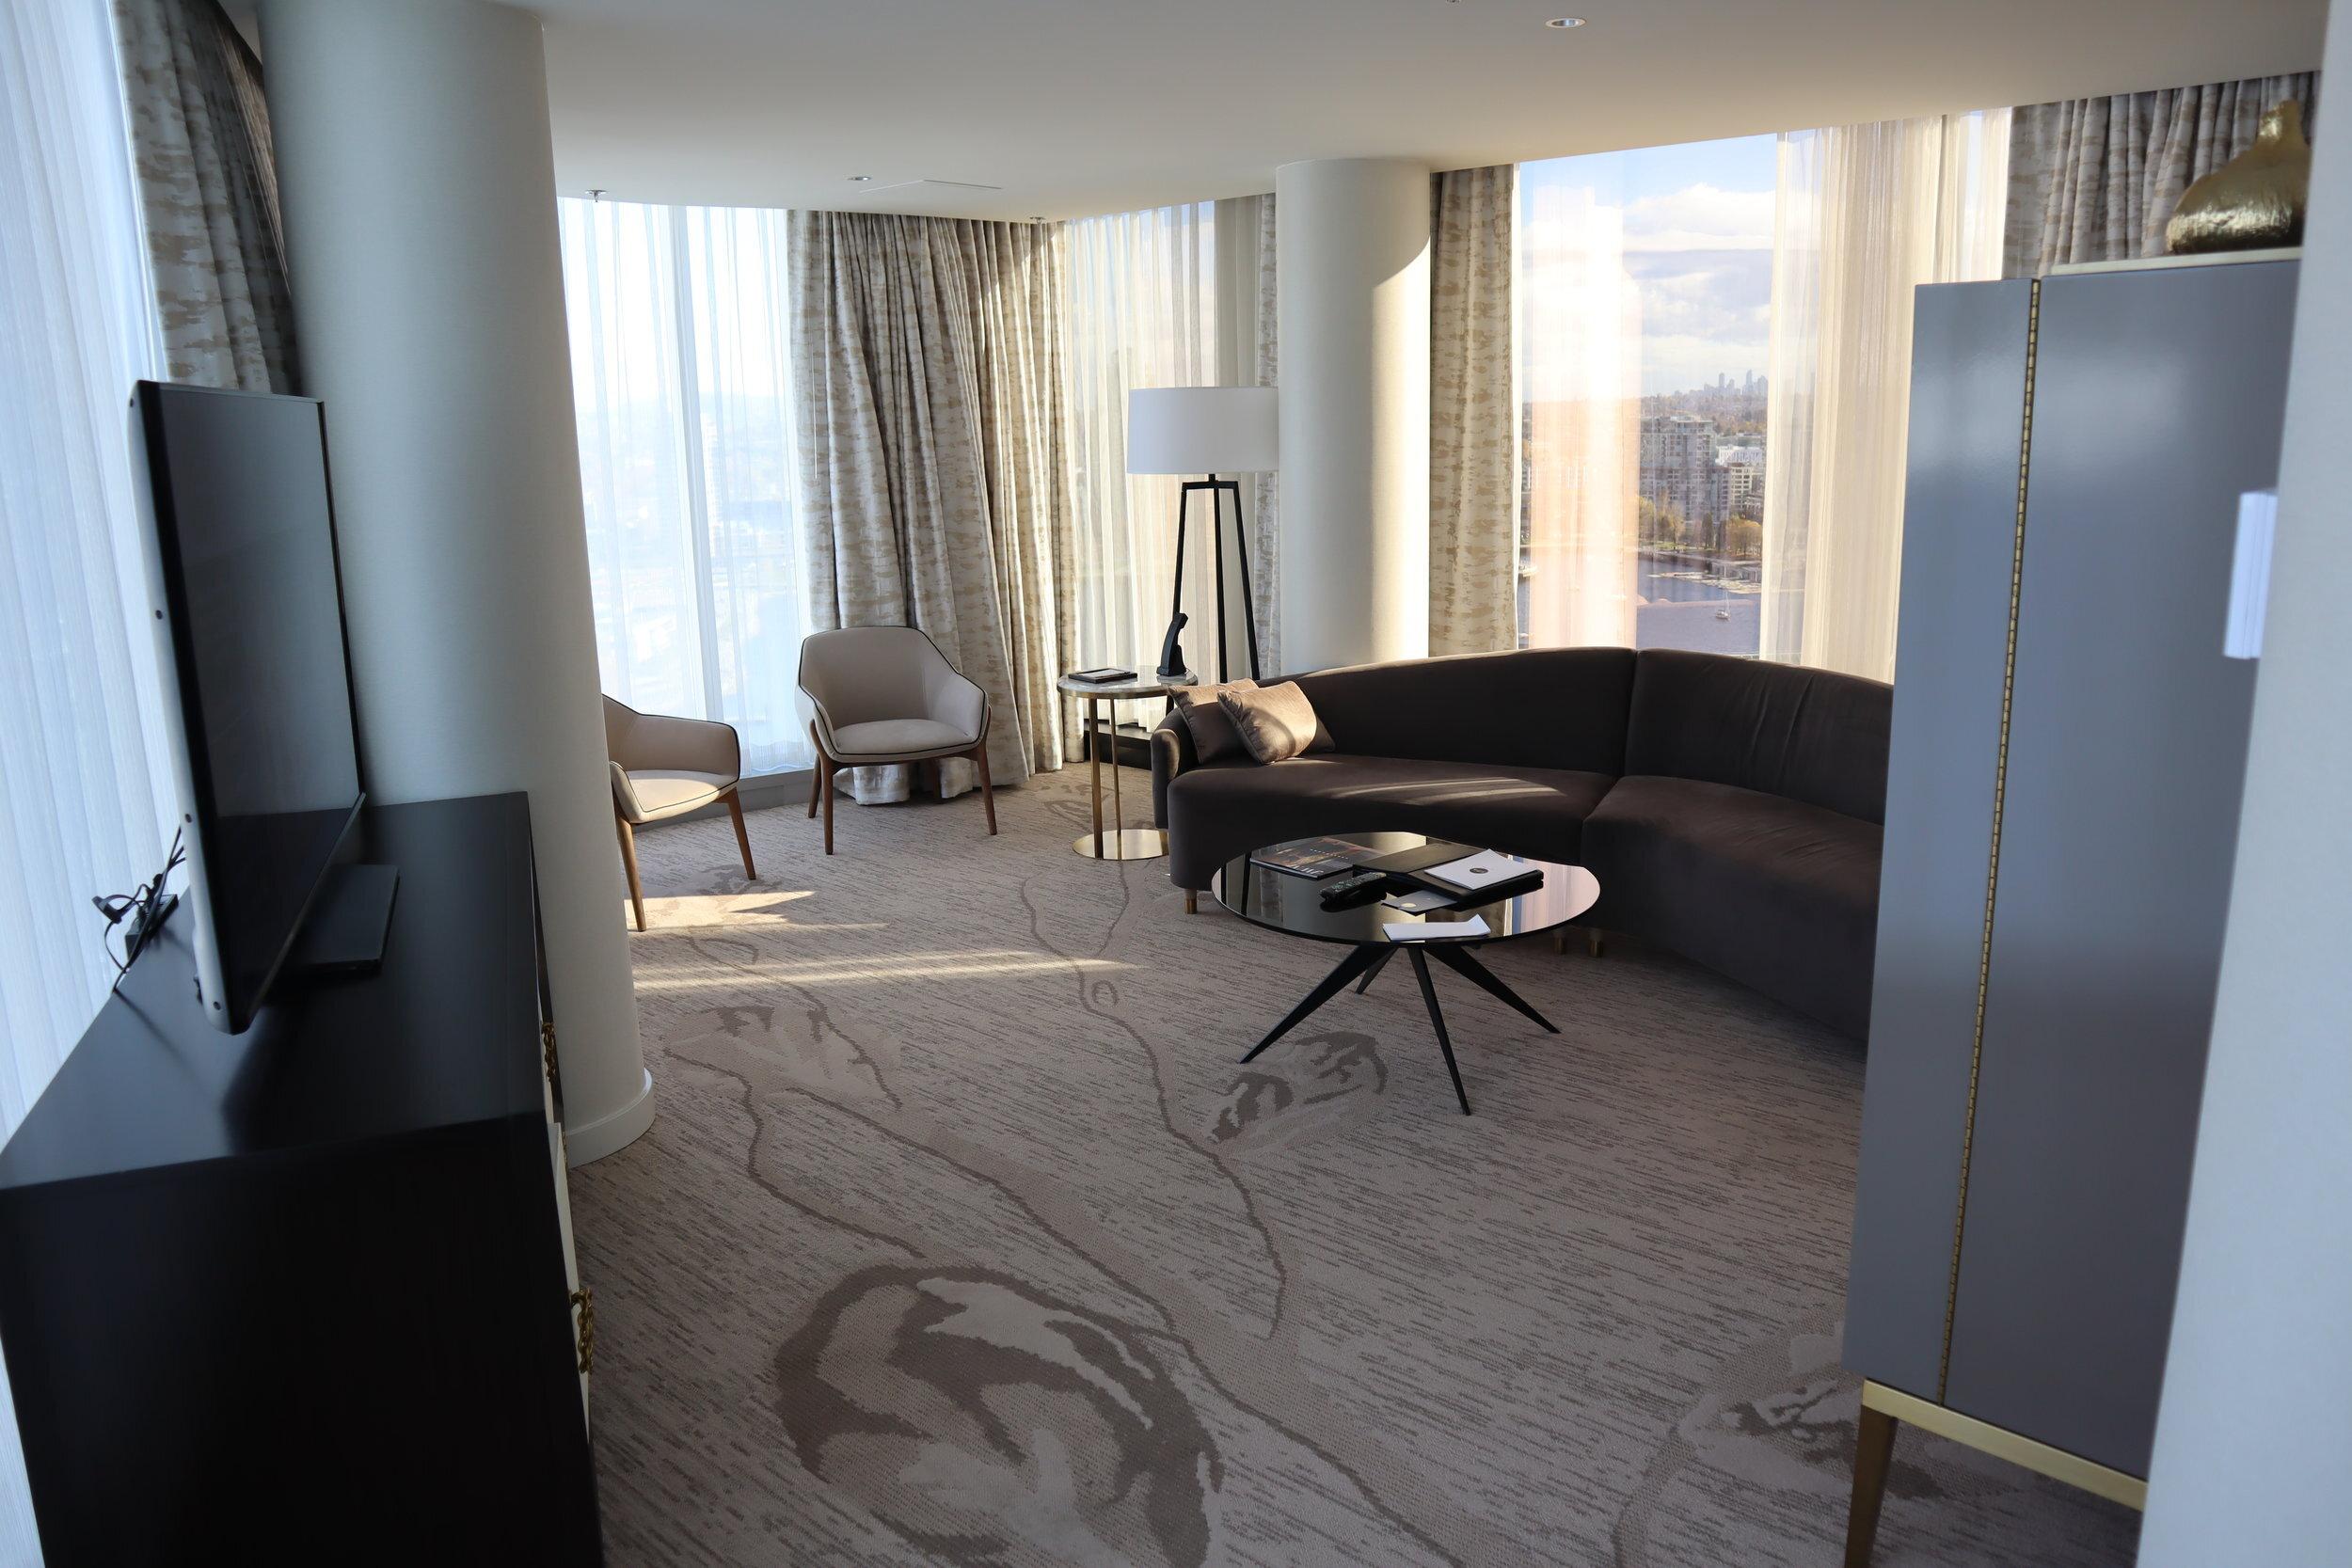 Executive Suite at the JW Marriott Parq Vancouver